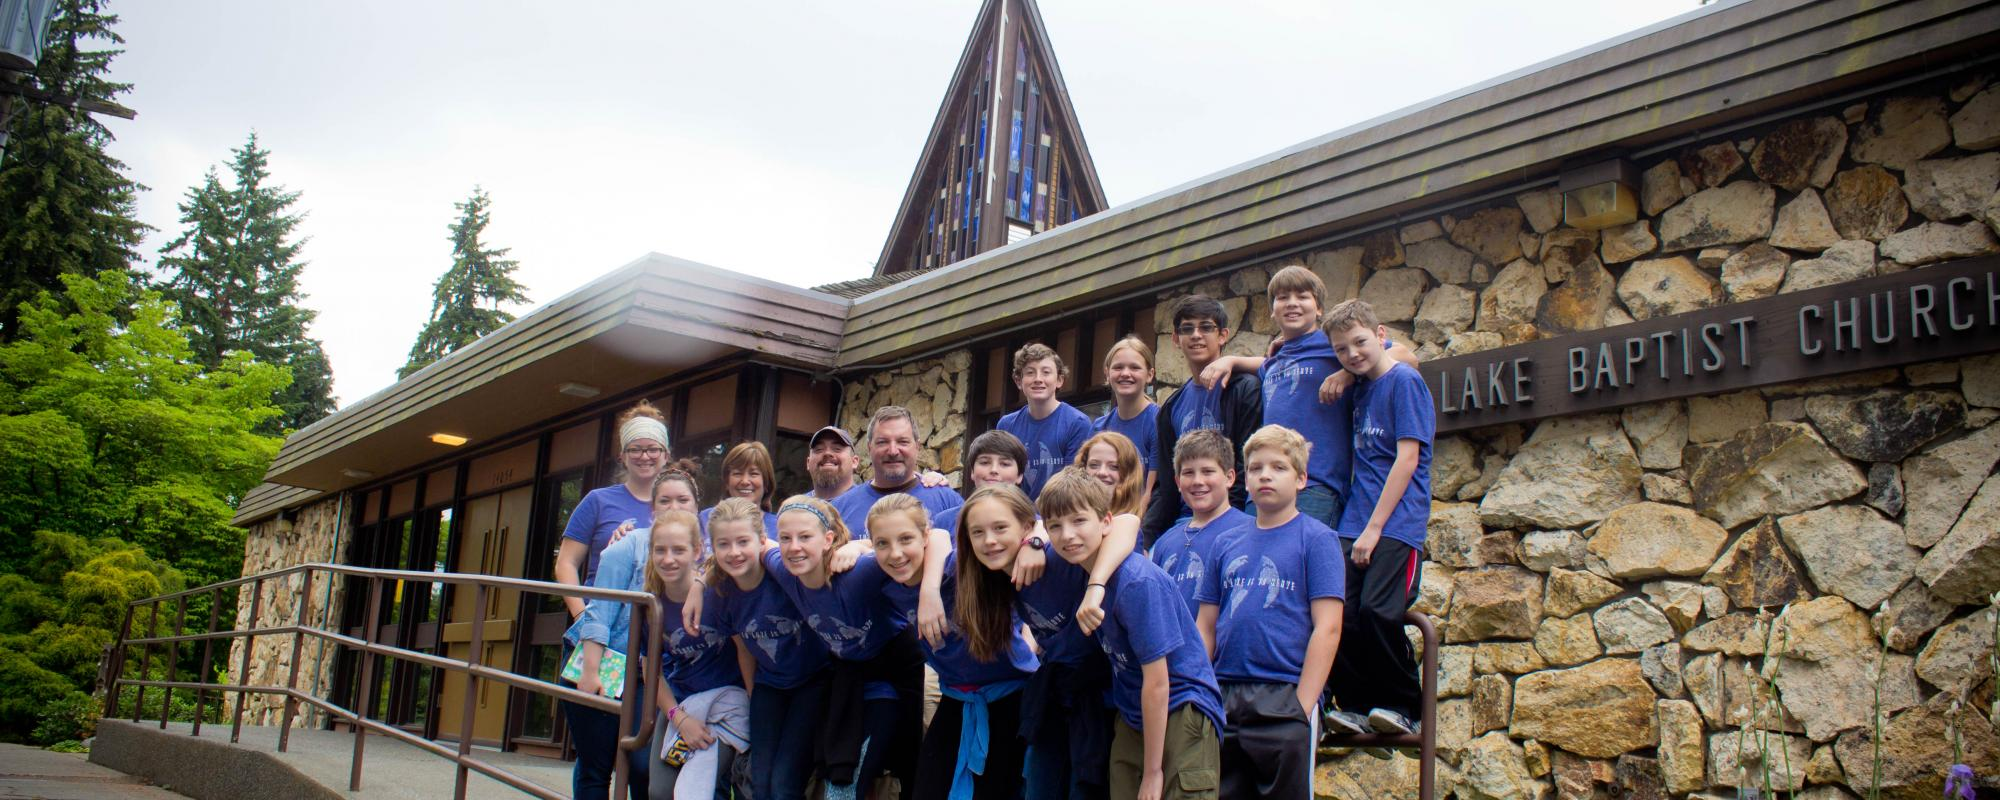 Lake Baptist Church Missionaries